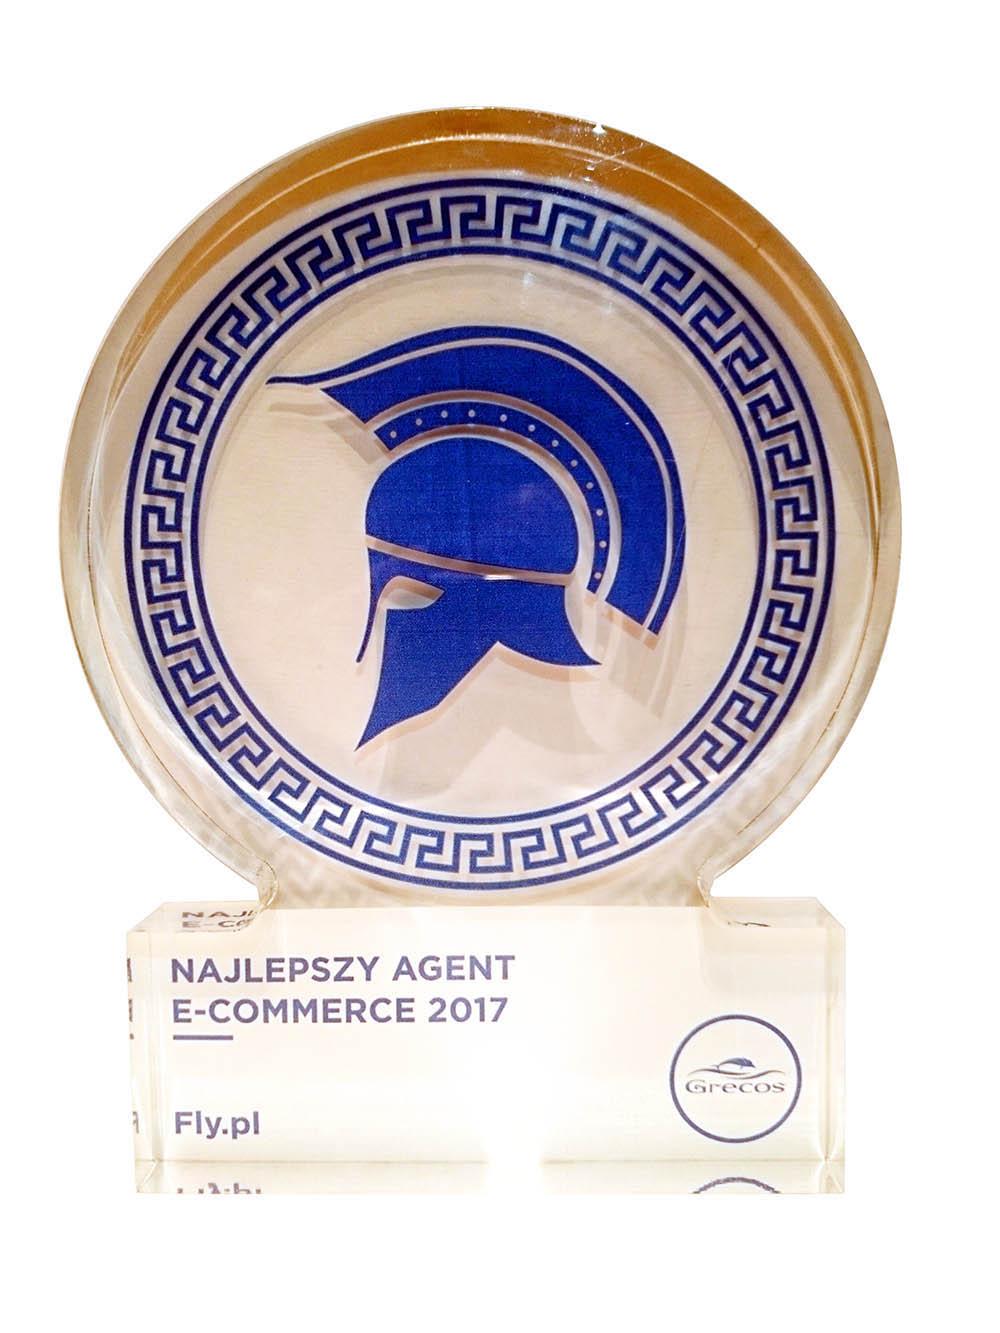 Nagroda Najlepszy Agent e-commerce 2017 od Grecos Holiday